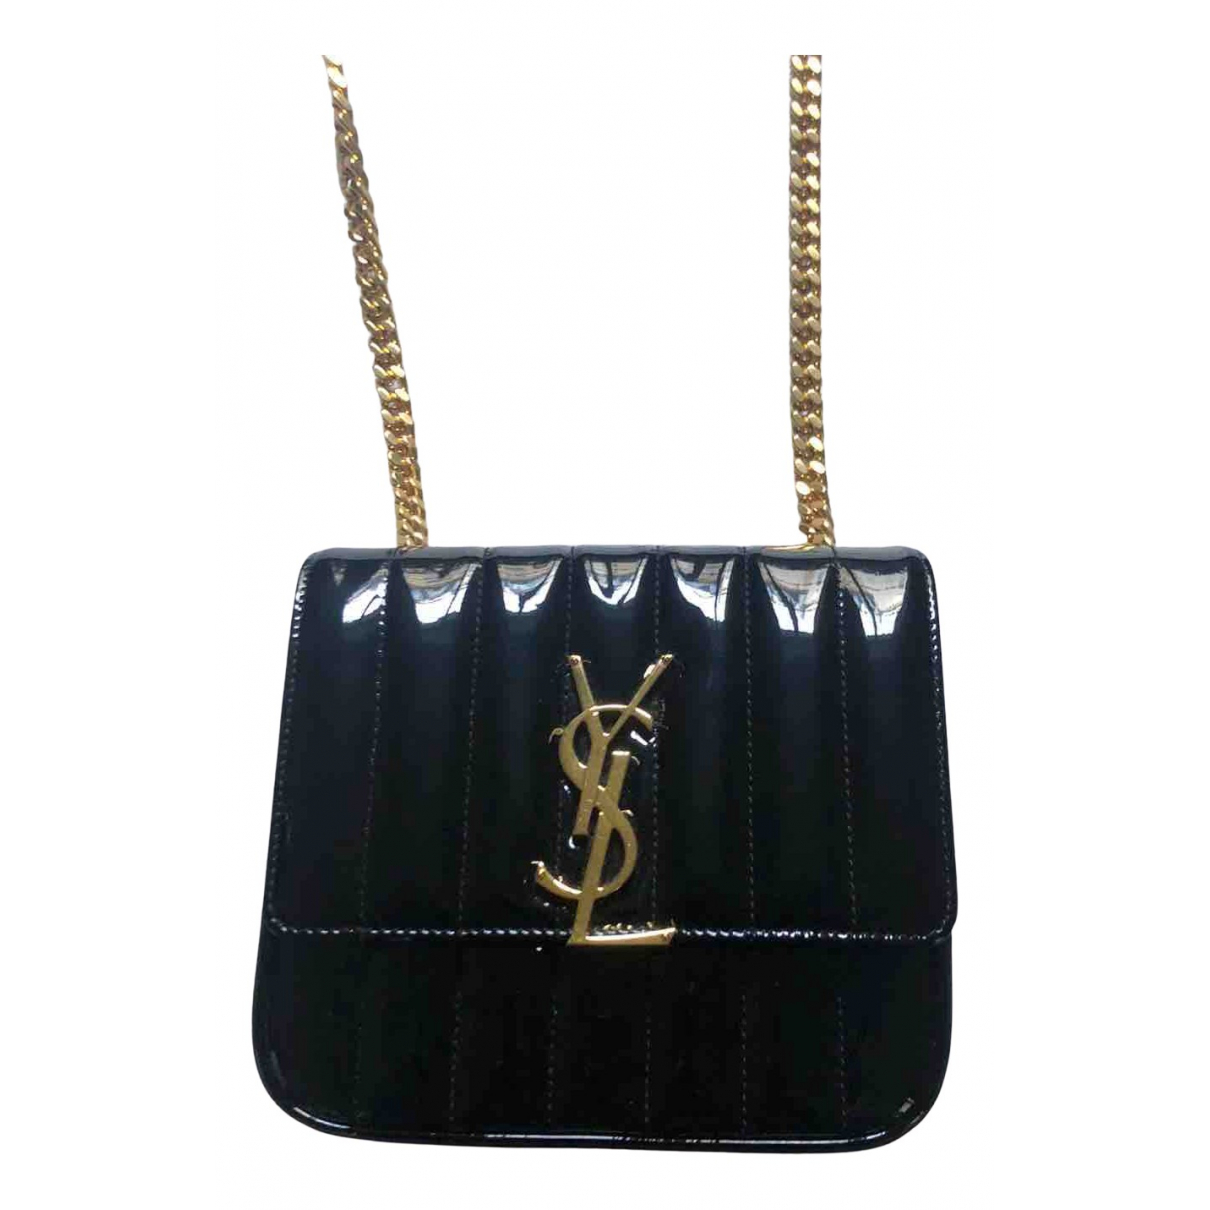 Saint Laurent Vicky Black Patent leather handbag for Women N